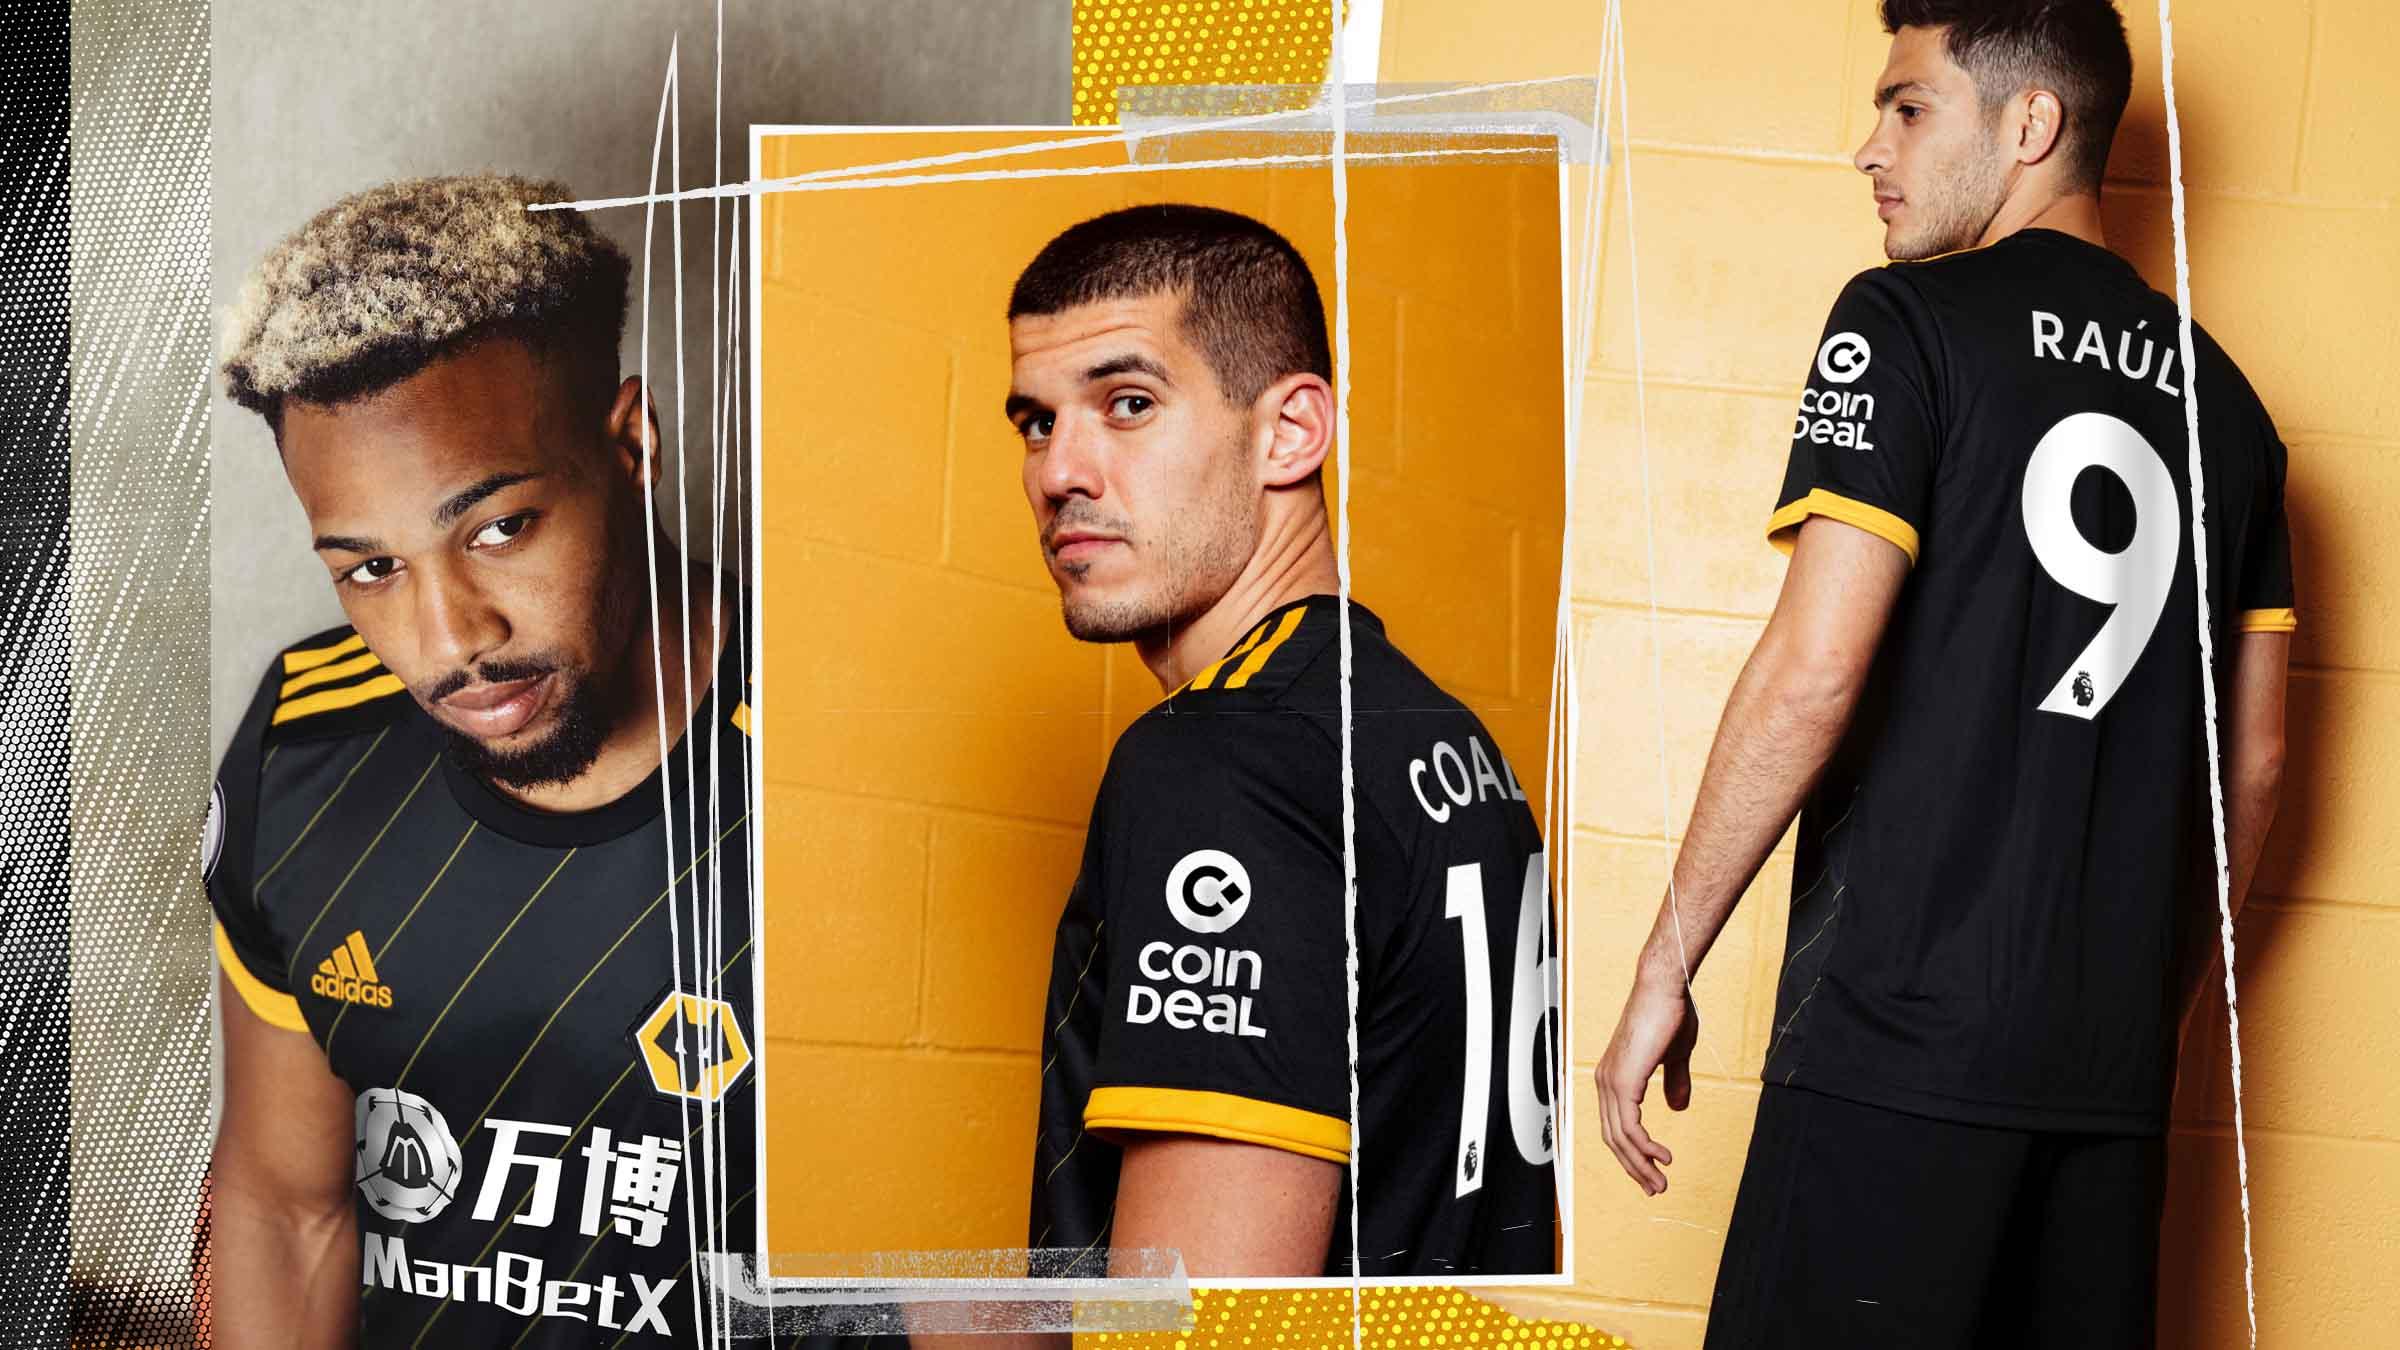 2019/20 away kit now on sale | Wolverhampton Wanderers FC